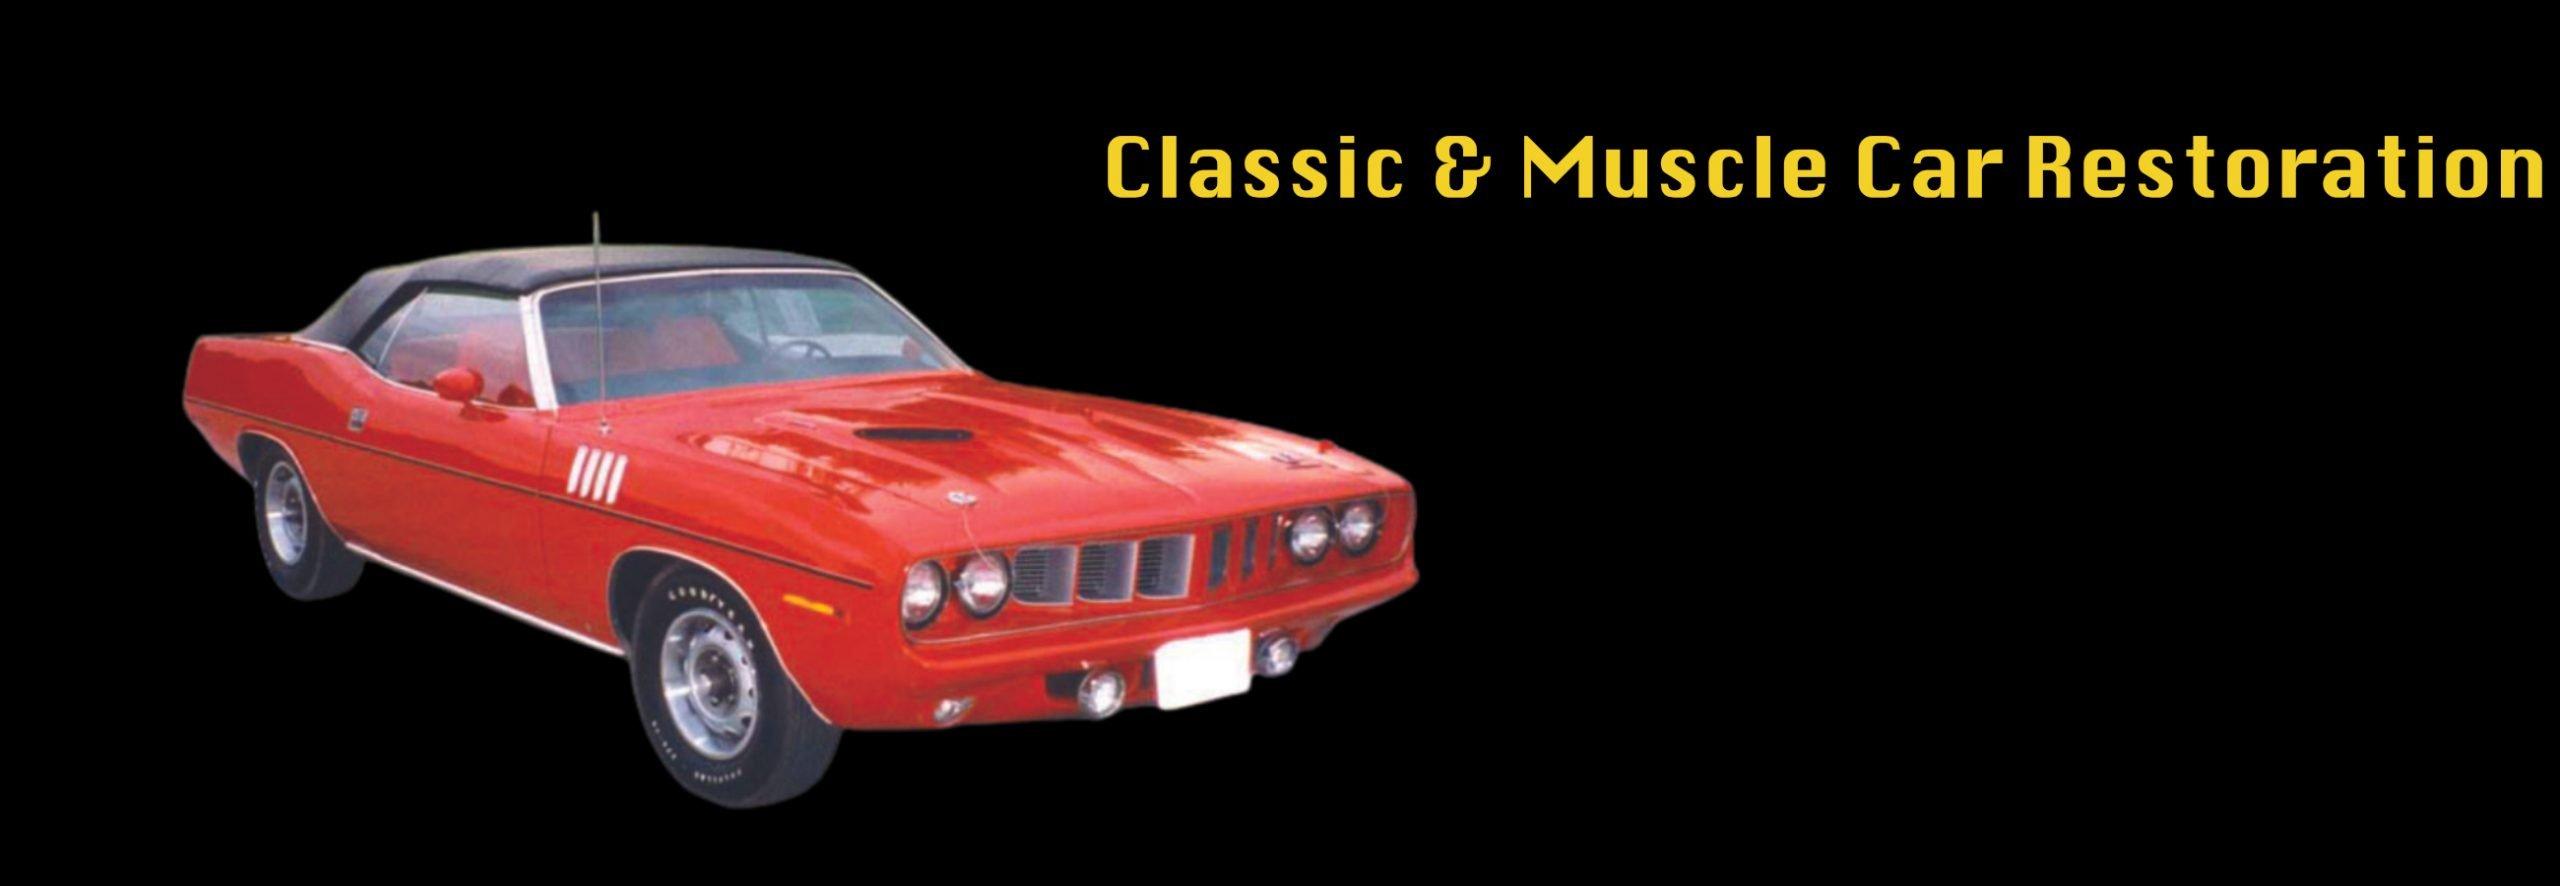 Classic & Muscle Car Restoration